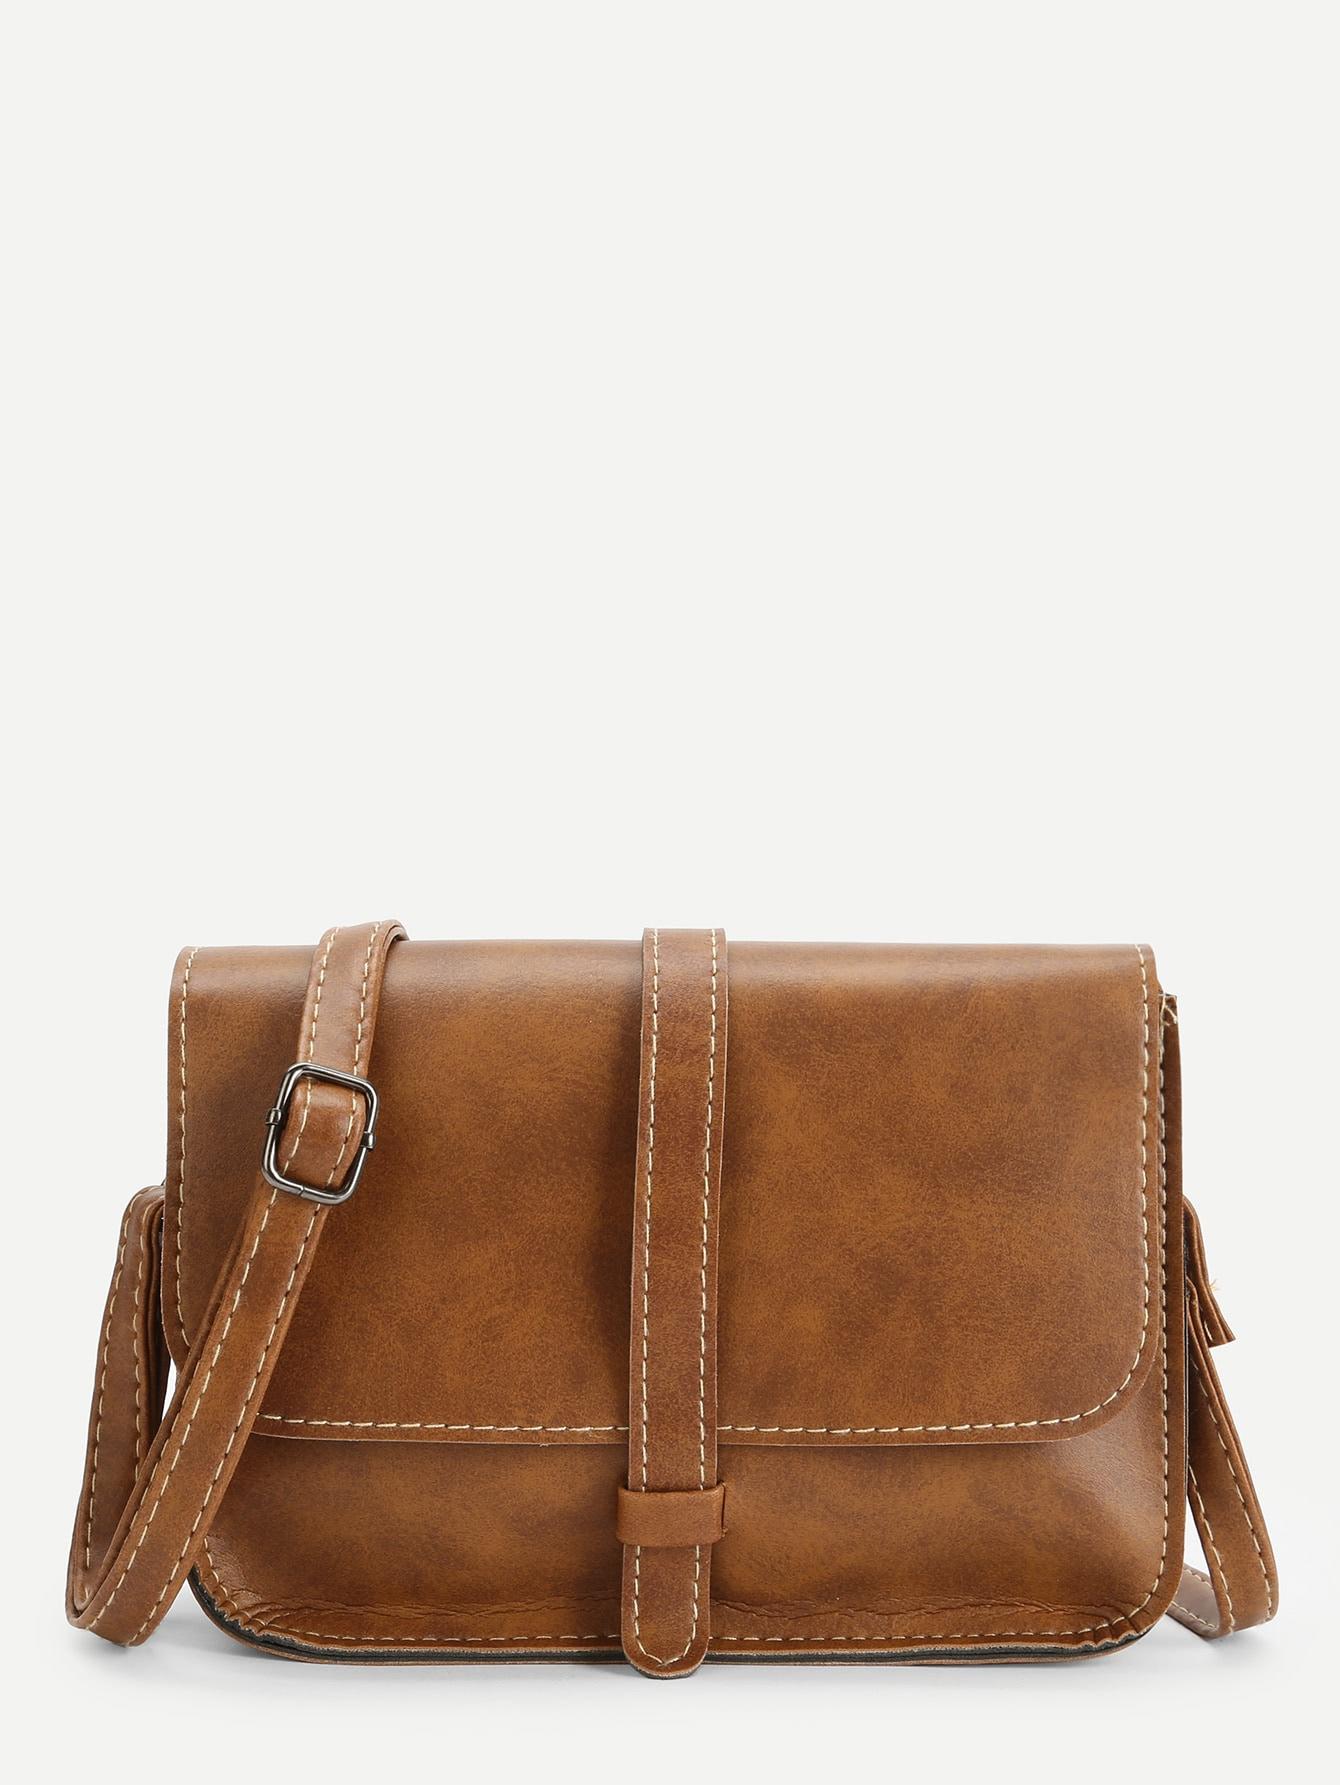 Seam Detail Flap Crossbody Bag